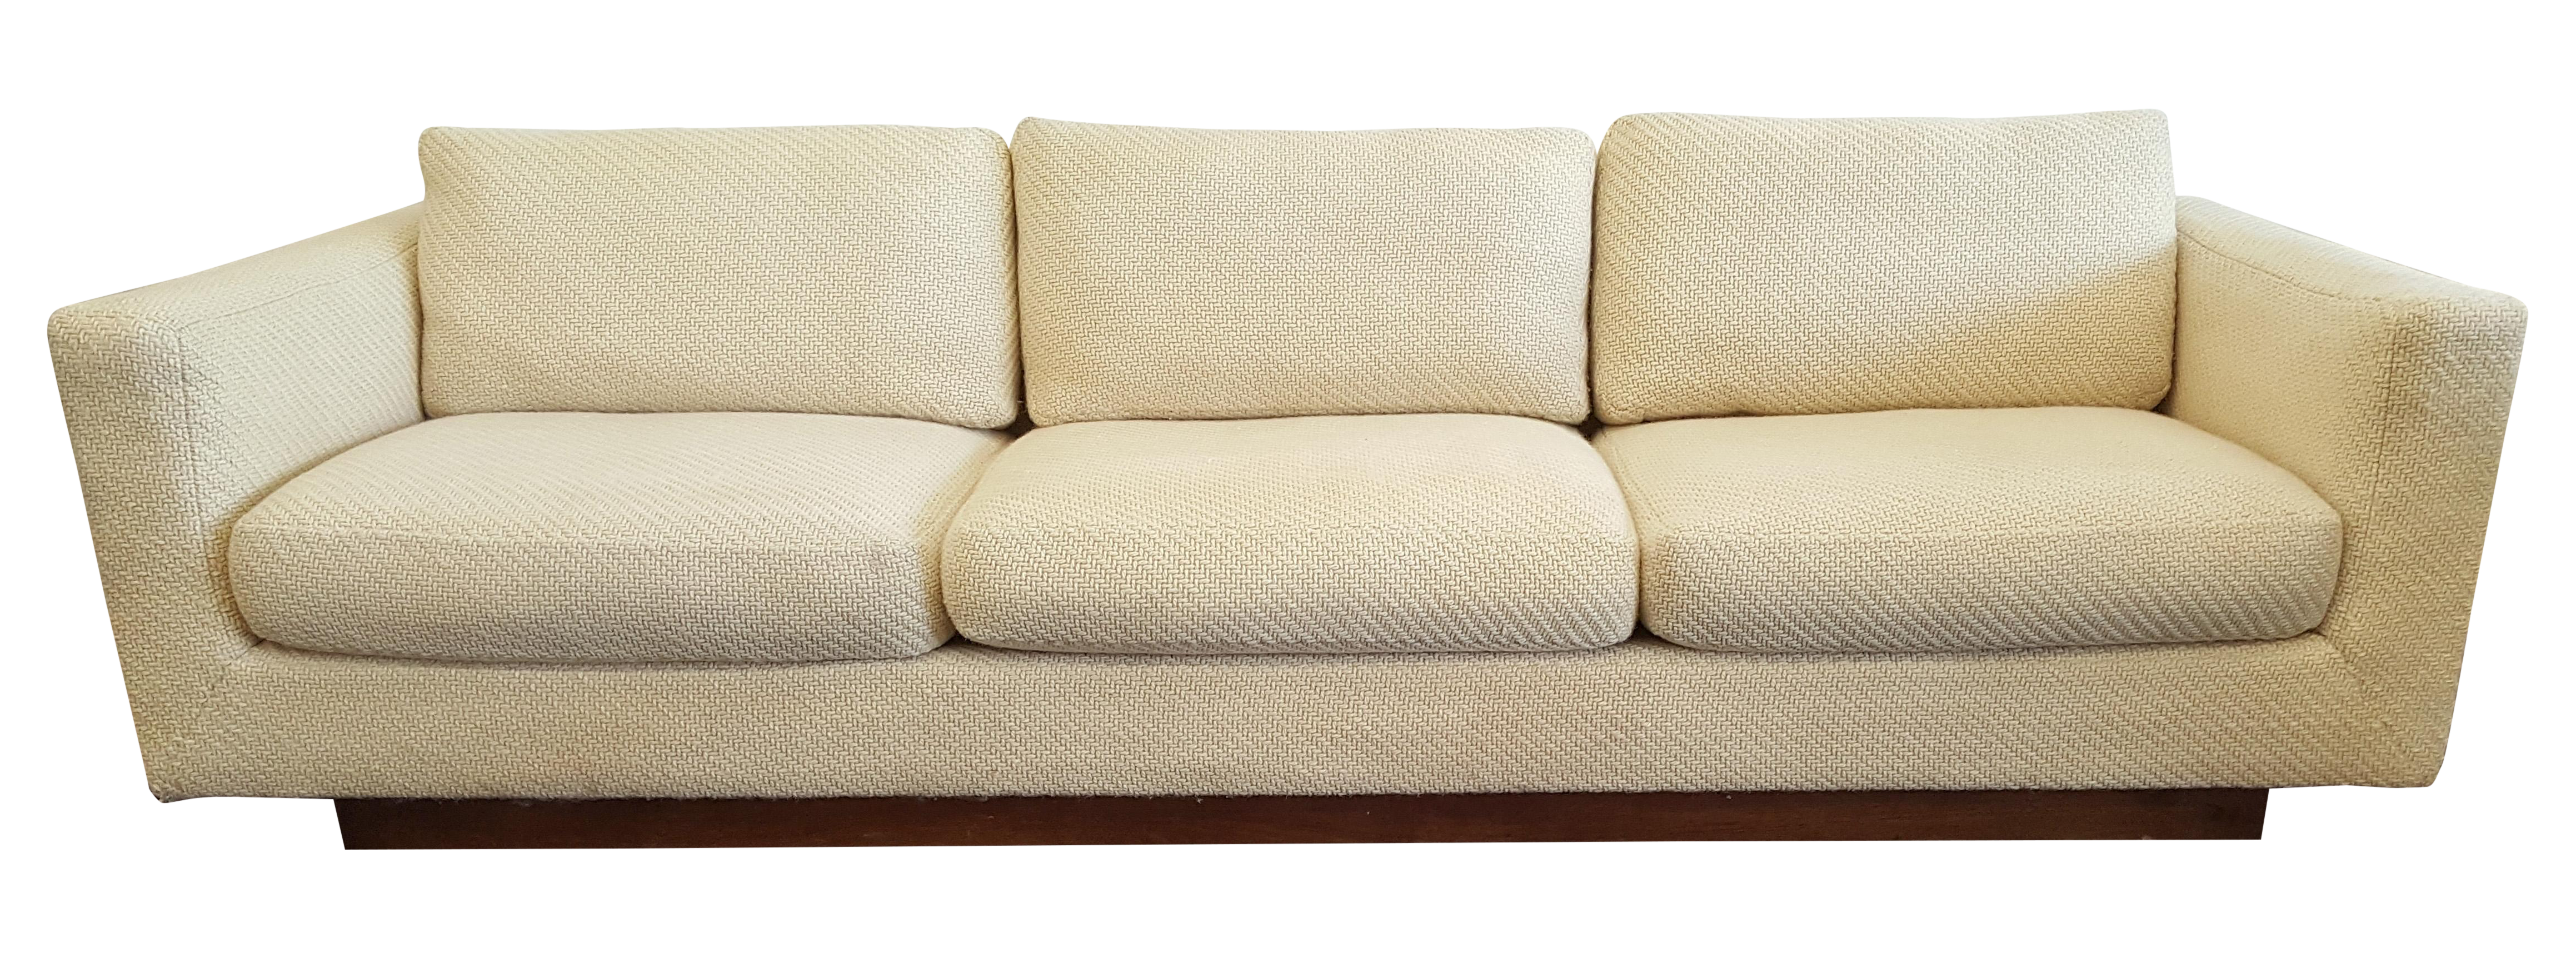 Mid Century Dunbar Tuxedo Sofa with Walnut Plinth